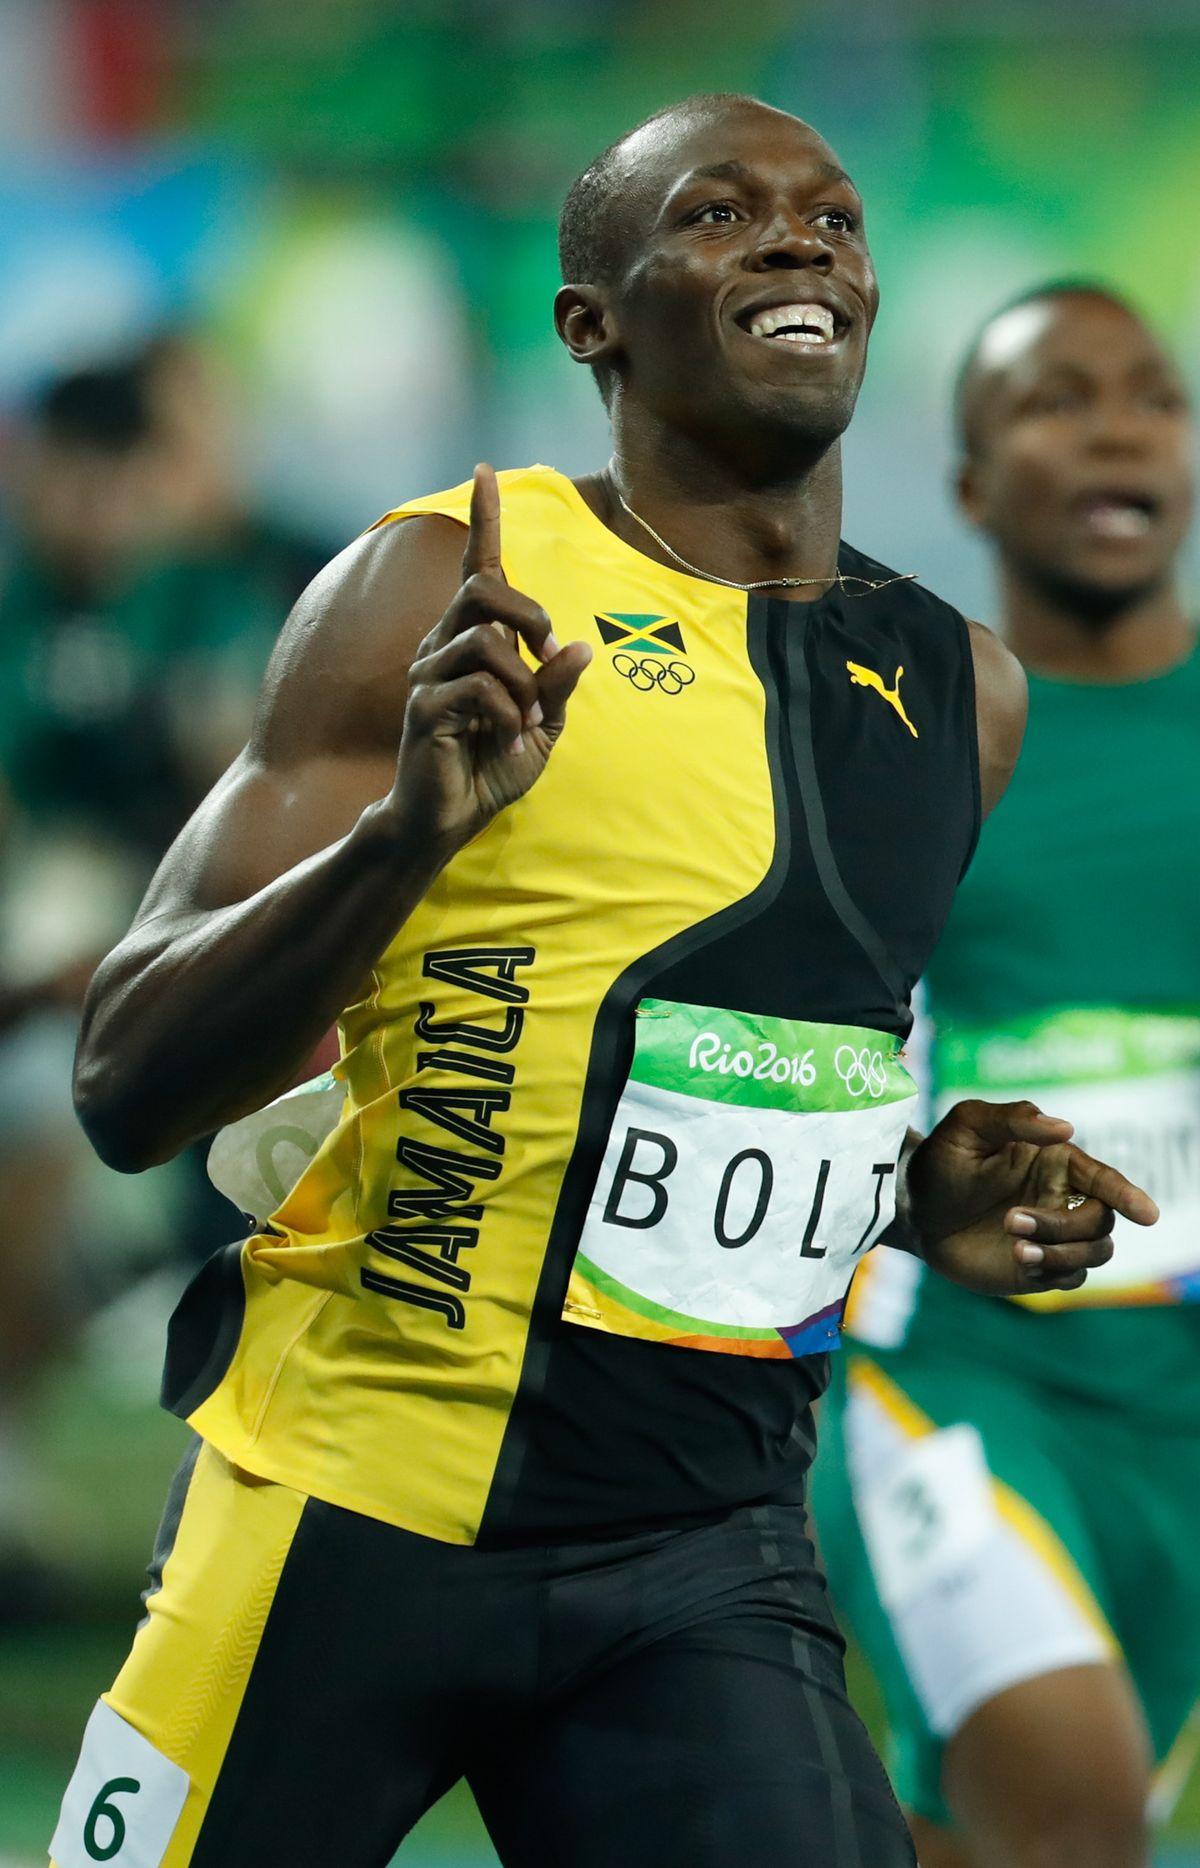 Bolt On Or Weld Cat Back